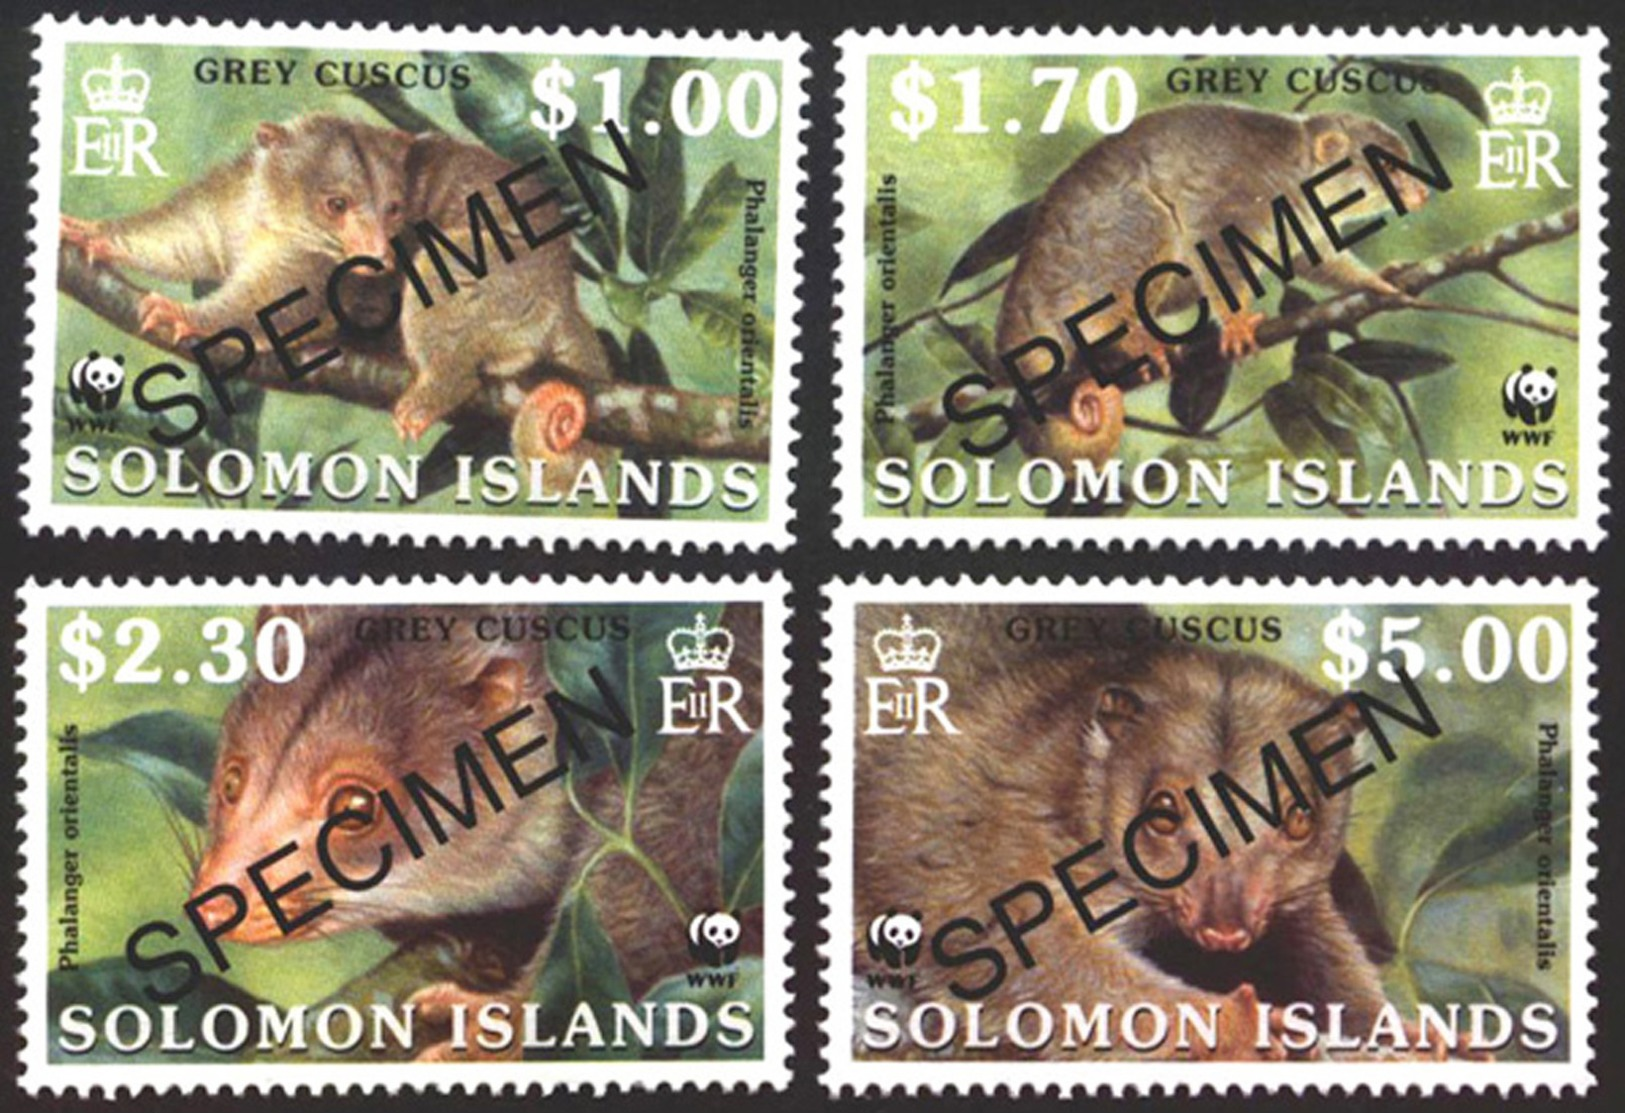 SOLOMON ISLANDS STAMPS, SET @F 4, FAUNA, WWF, SPECIMEN, MNH - Solomon Islands (1978-...)